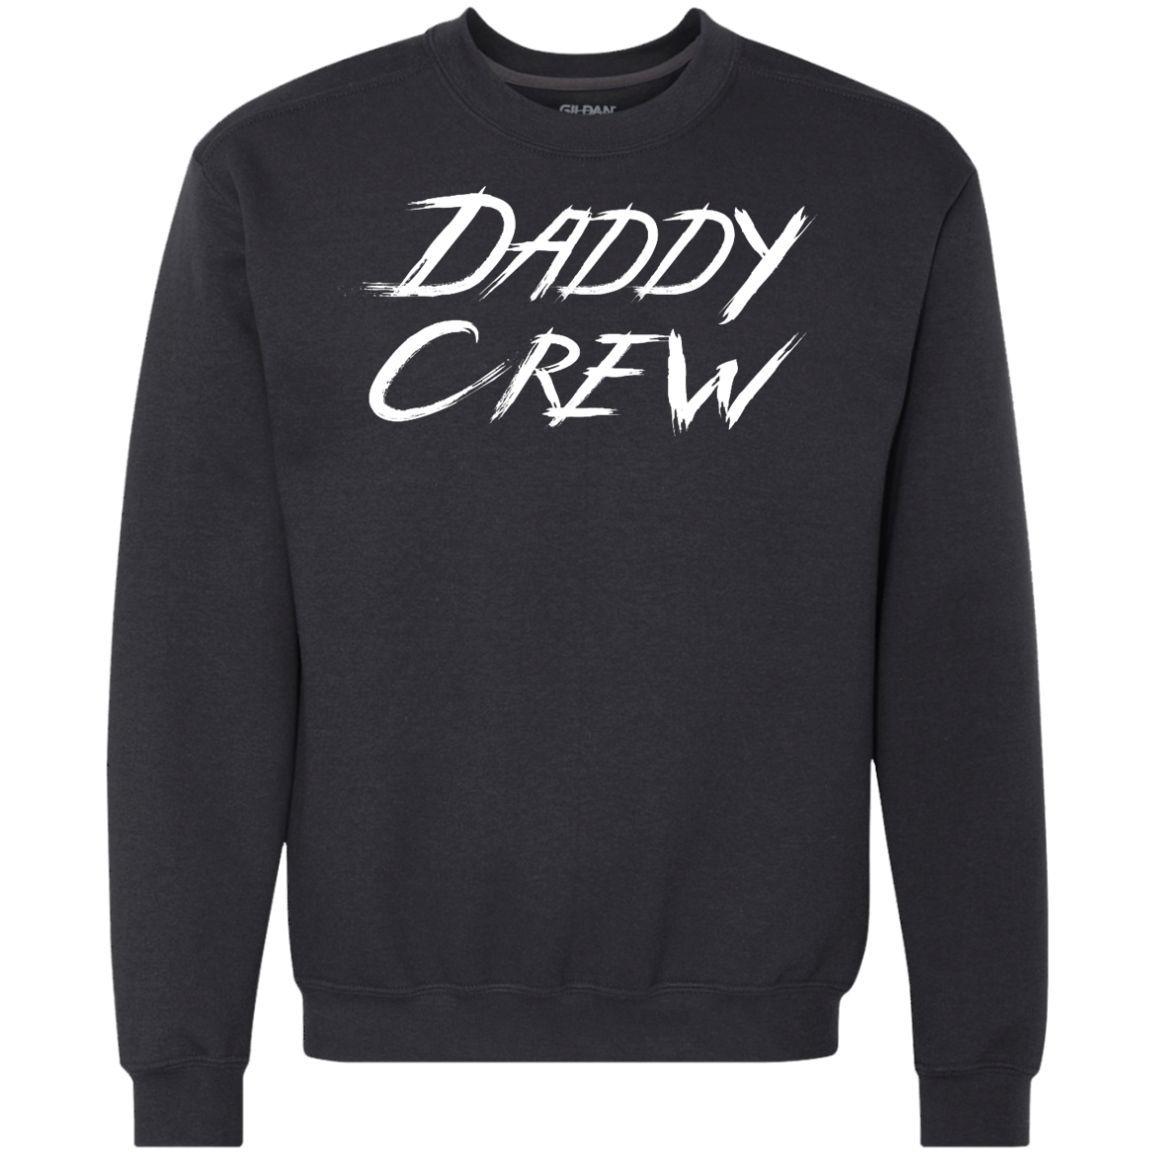 Daddy Crew | Crewneck Sweatshirt